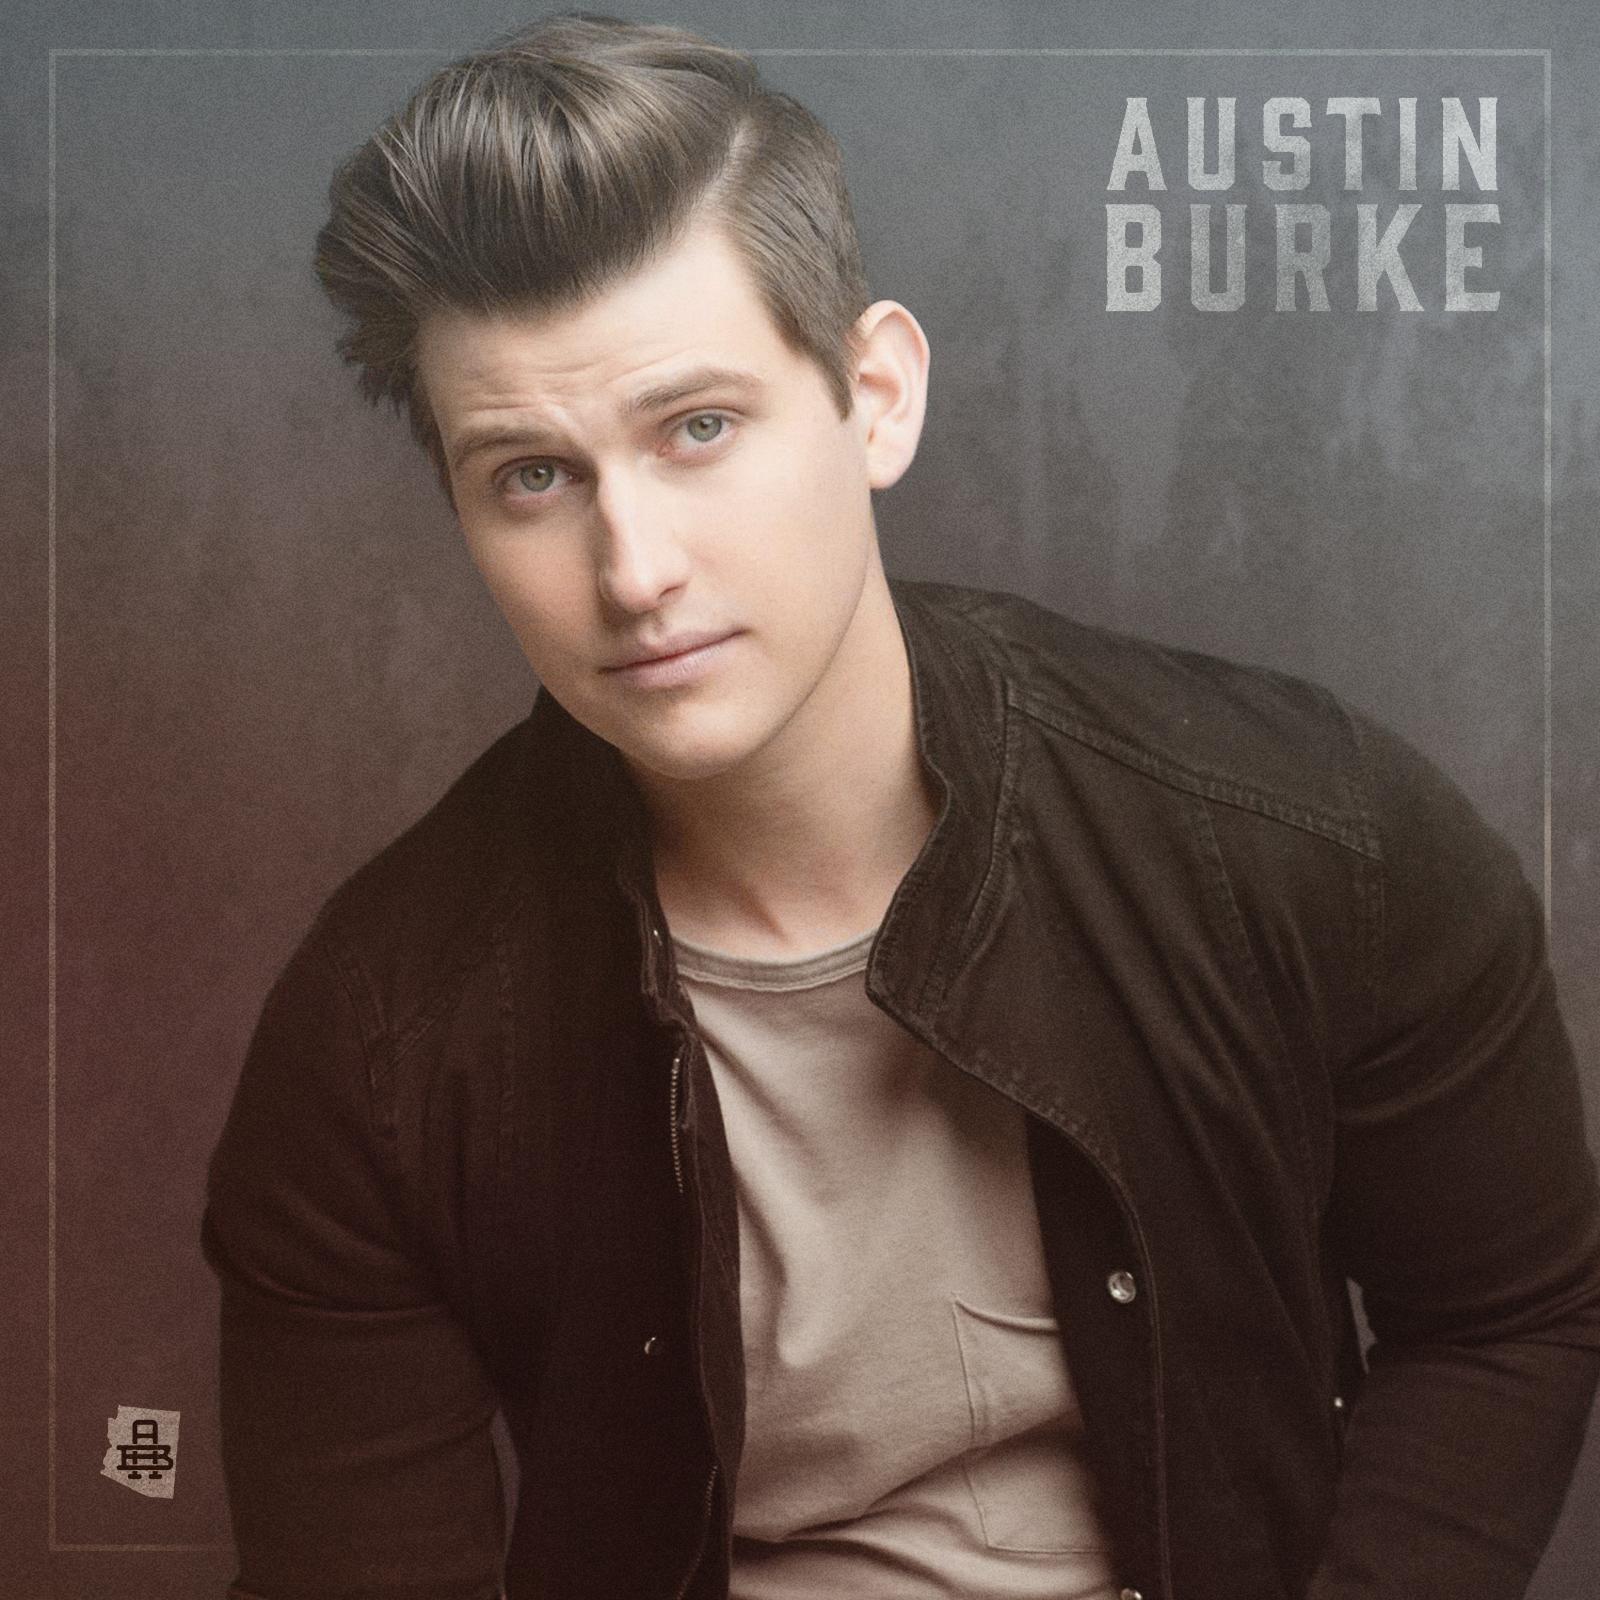 Austin Burke